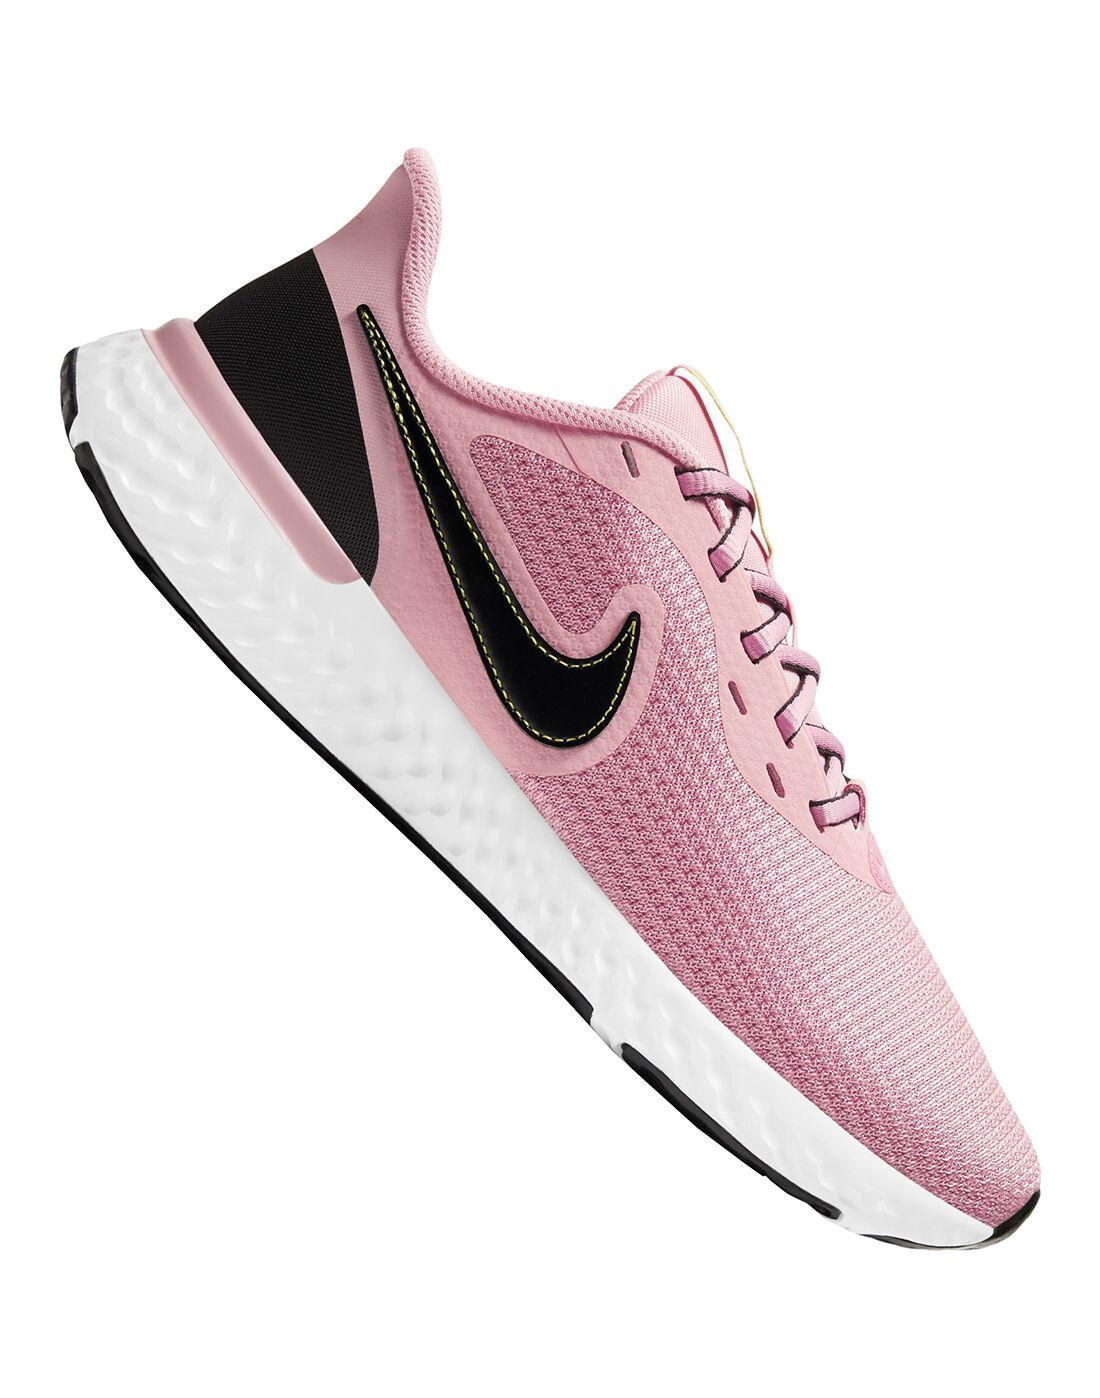 Nike boys adidas ortholite shoes grey high top vans | Womens Revolution 5 Ext